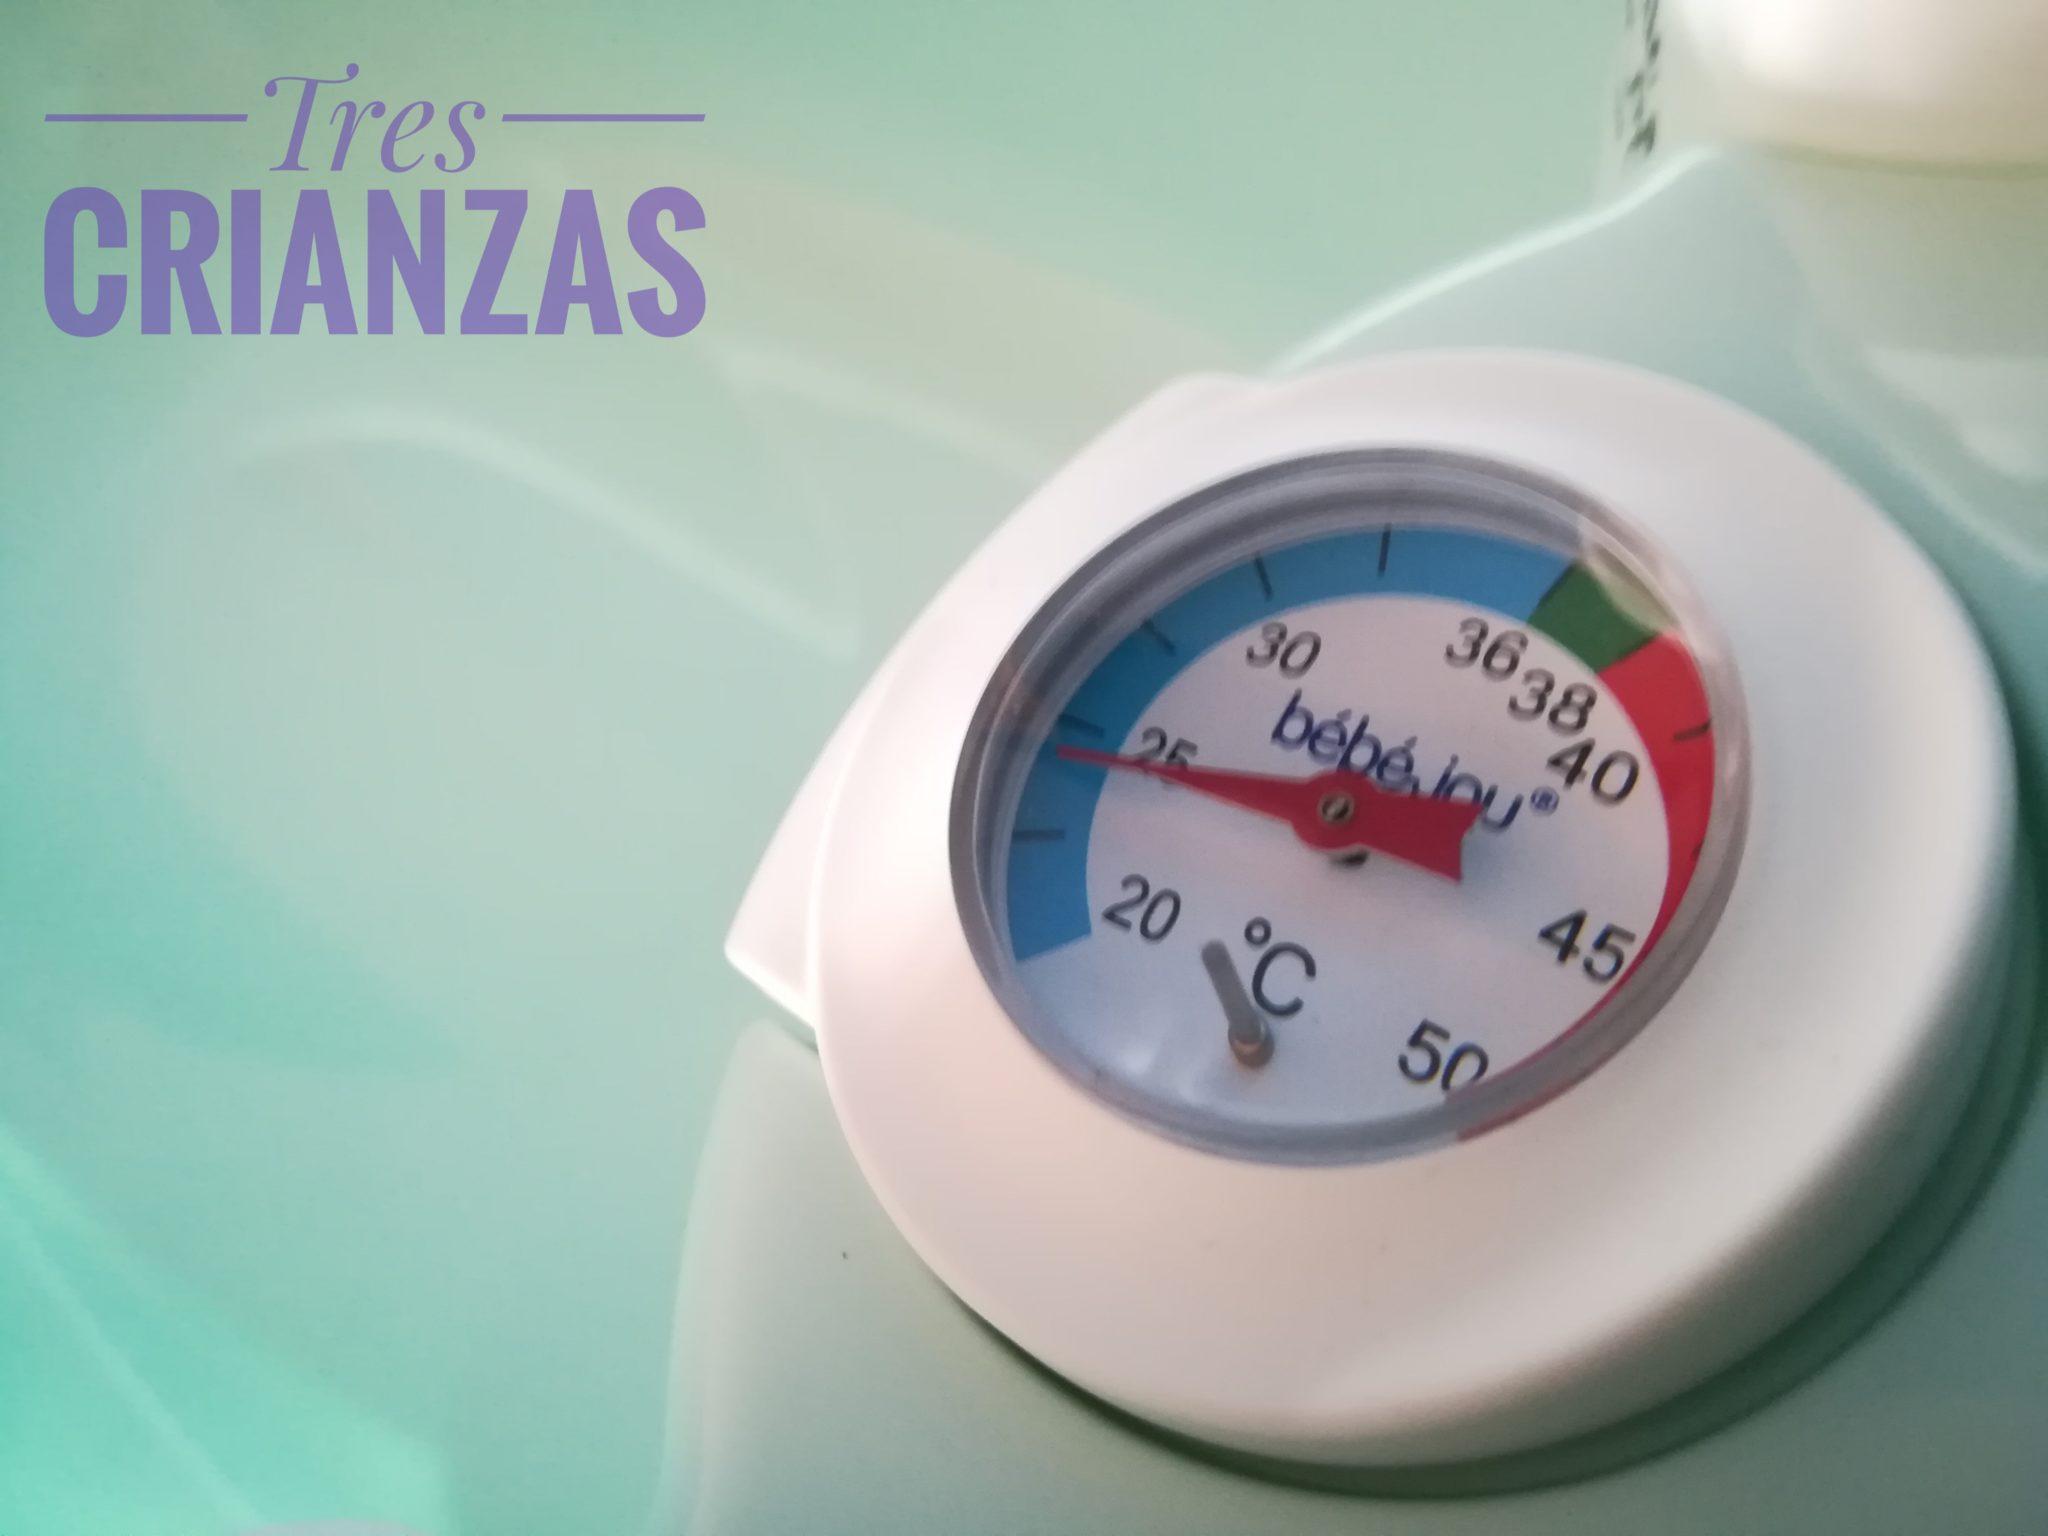 IMG 20180311 122650 01 - Bañeras de bebé: la termobañera de Bebe-Jou